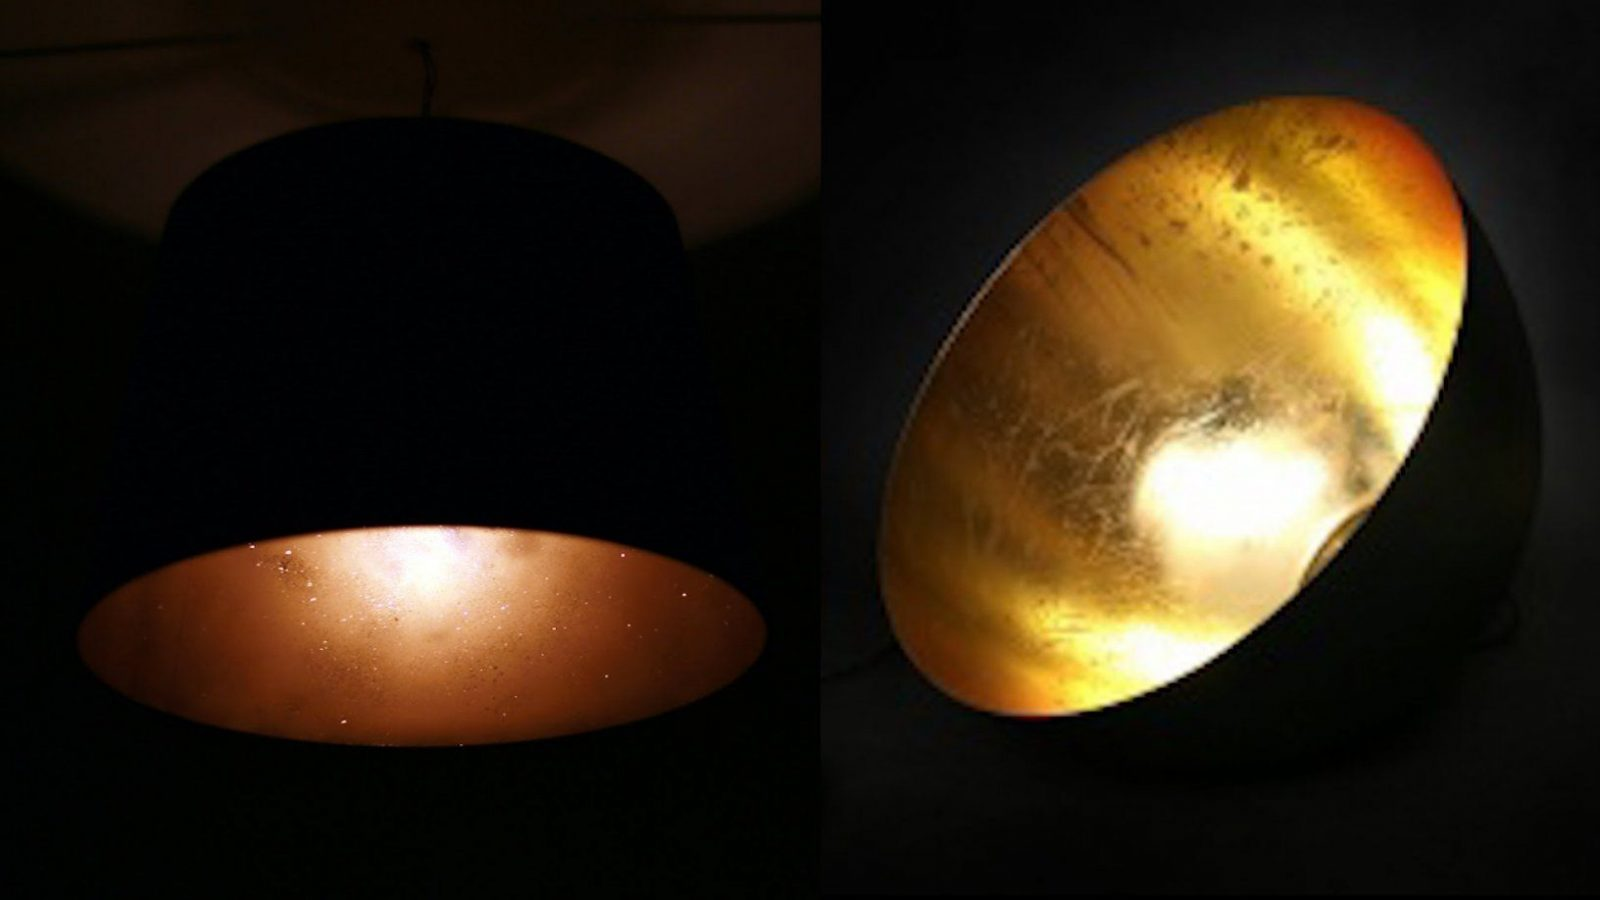 Designer Lampe Goldschwarz Ikea Hack Diy Youtube Von Ikea Lampe